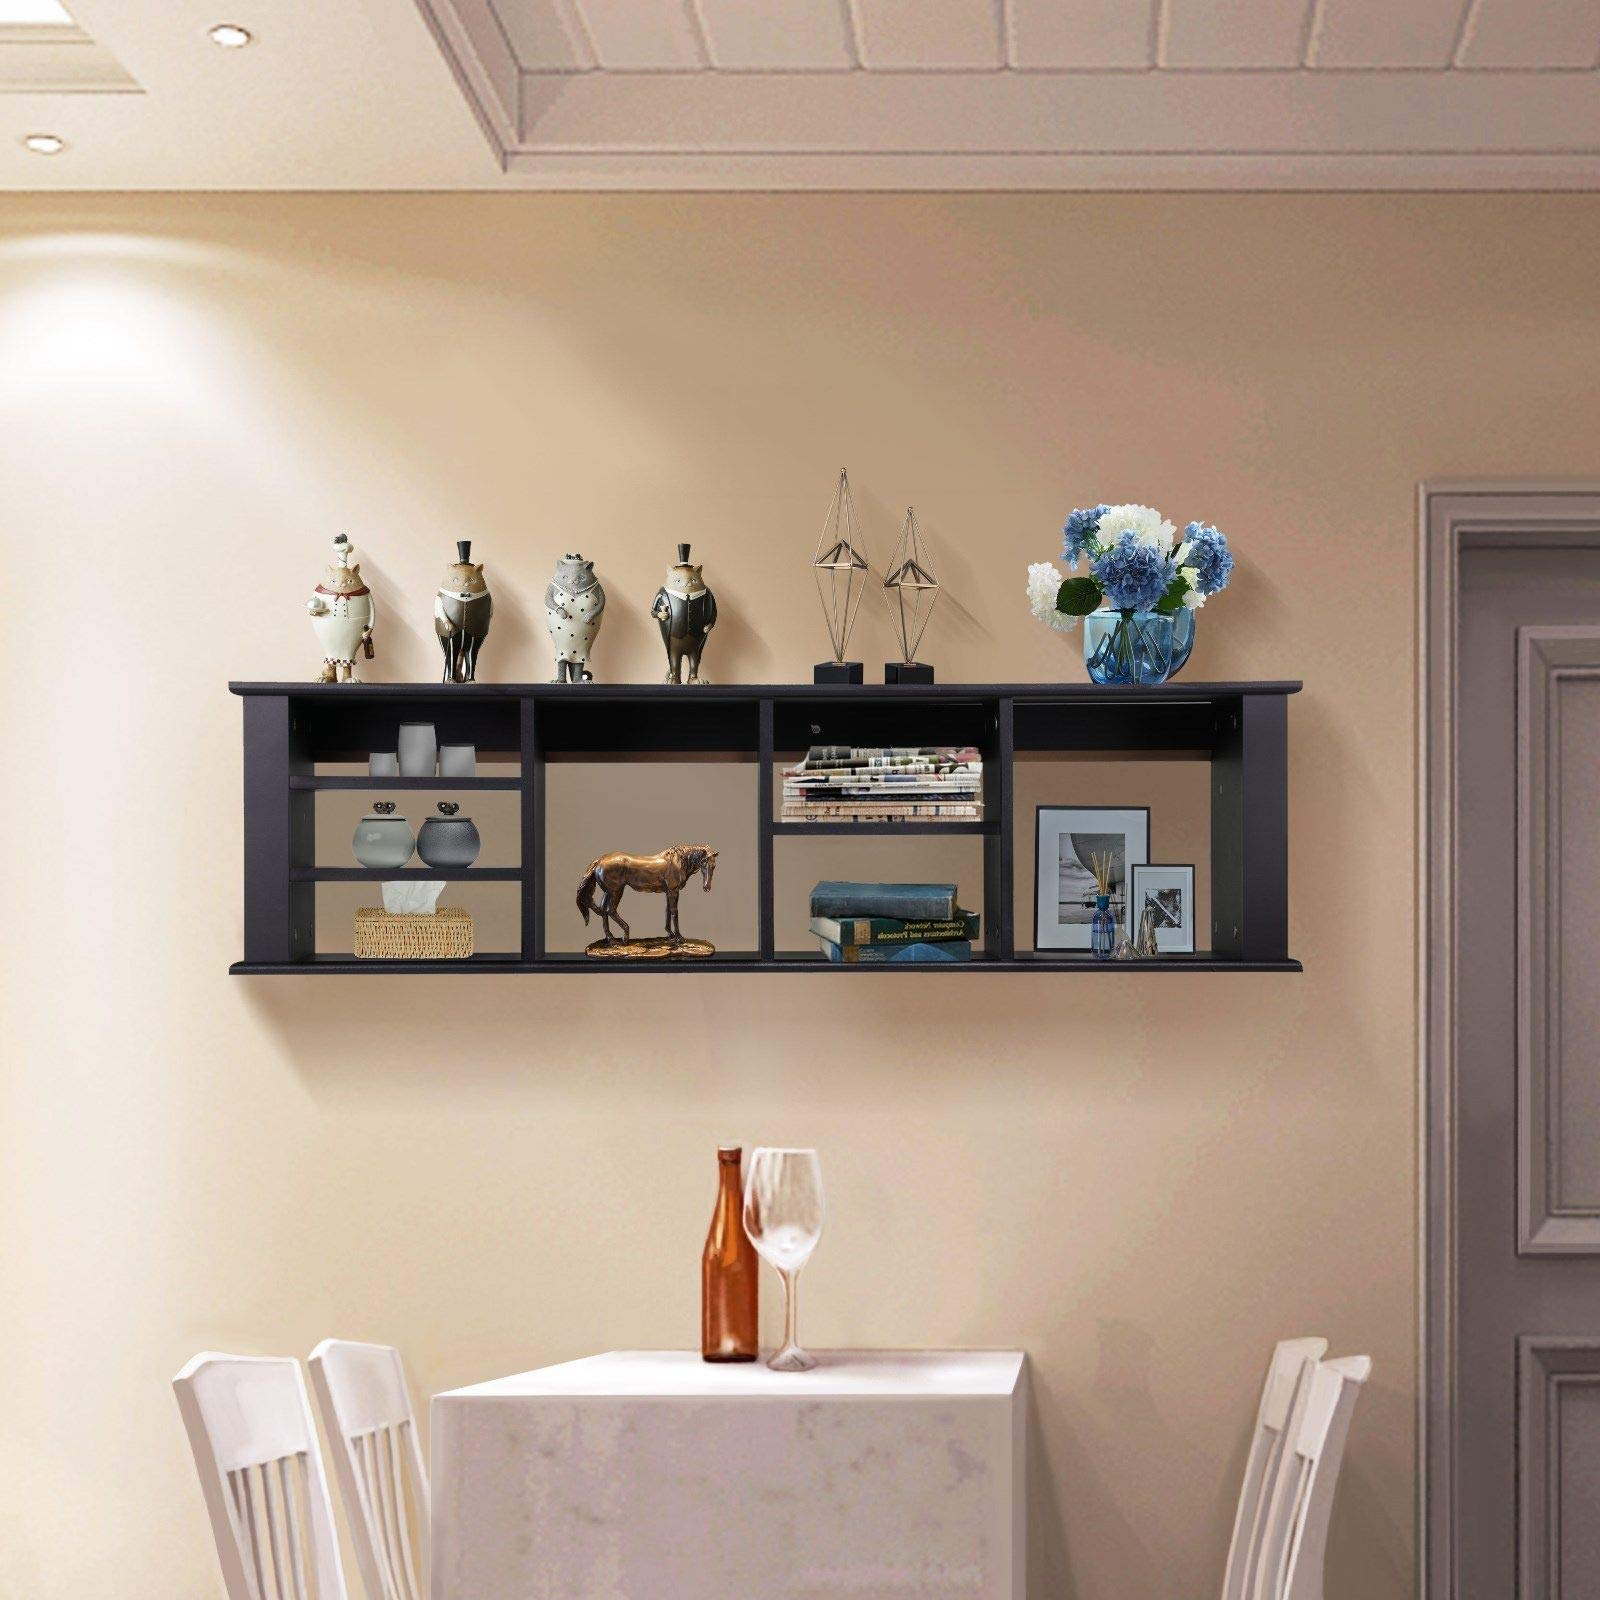 LOVELABEL Home Décor Wall Mount Hutch Floating Storage Shelf Hanging Cabinet Organizer